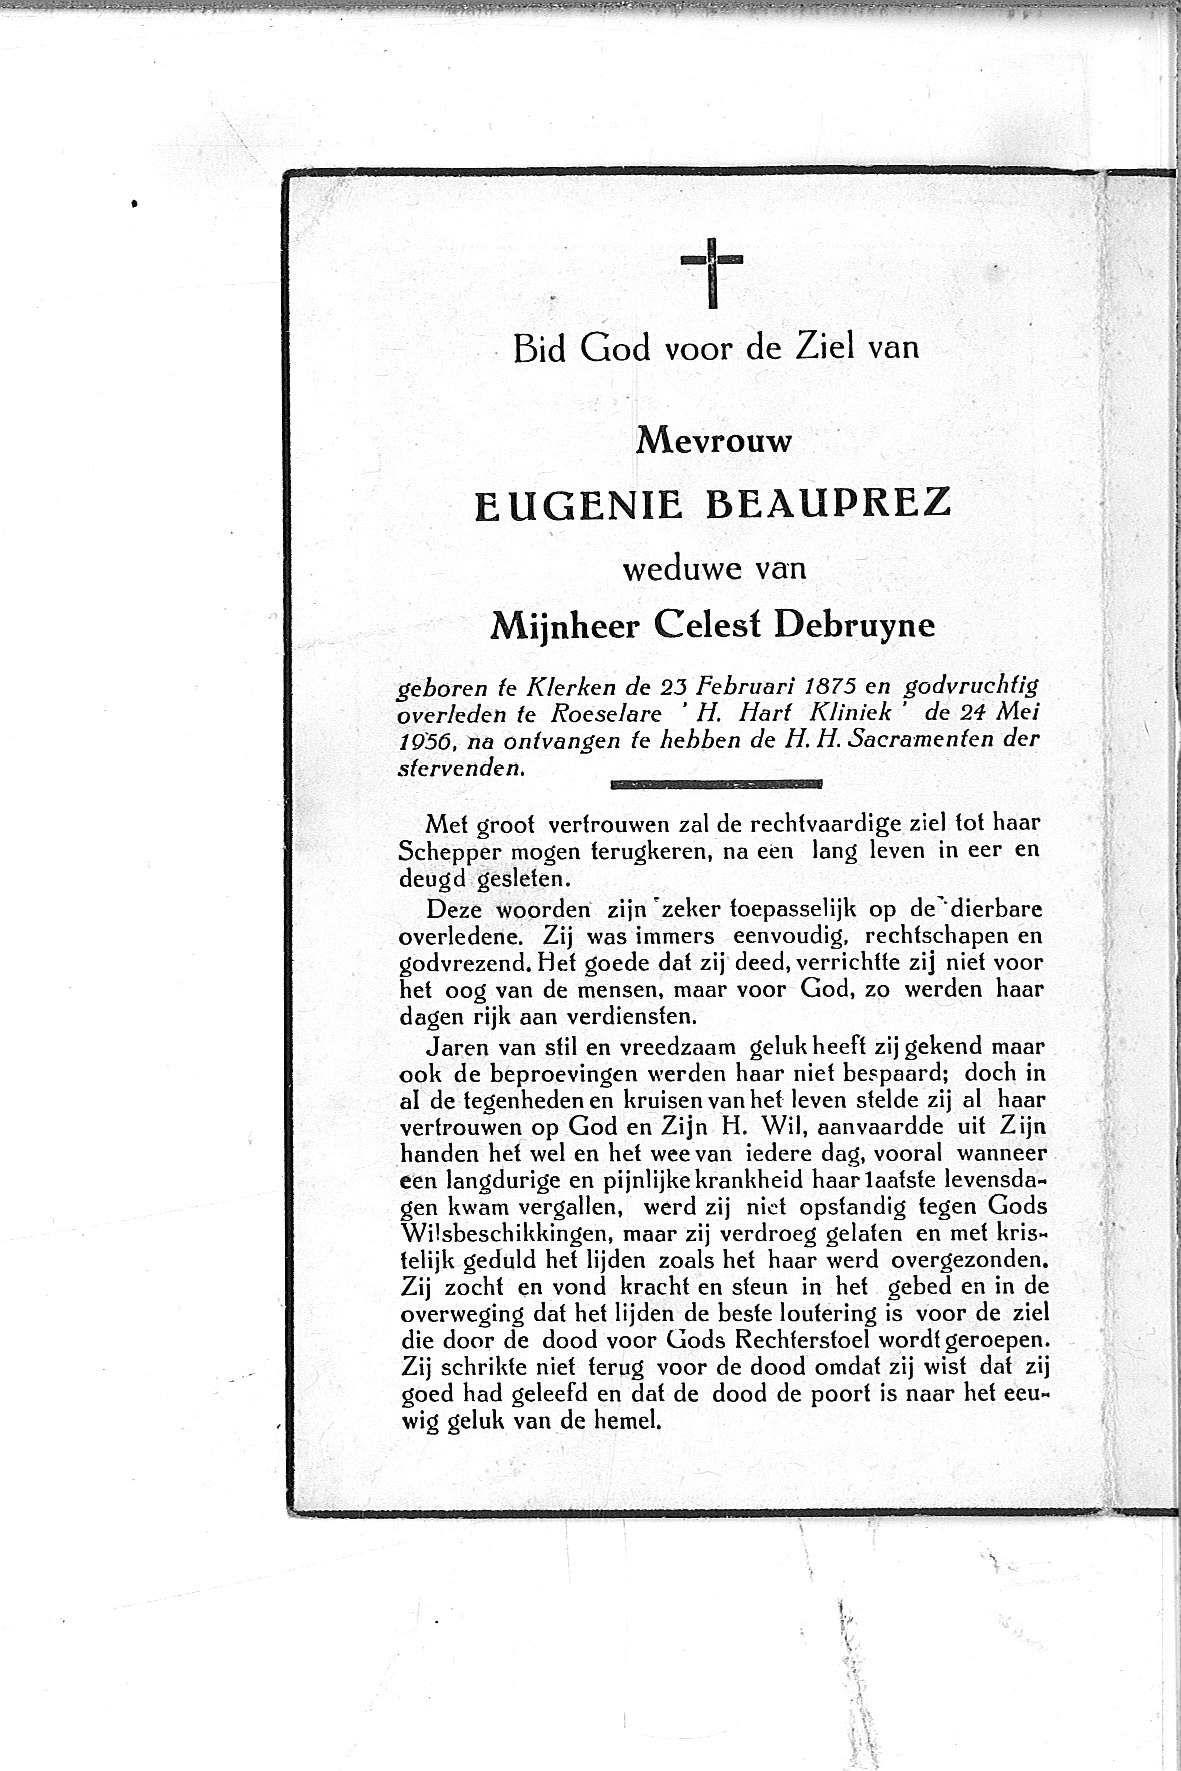 Eugenie(1956)20130828133432_00097.jpg